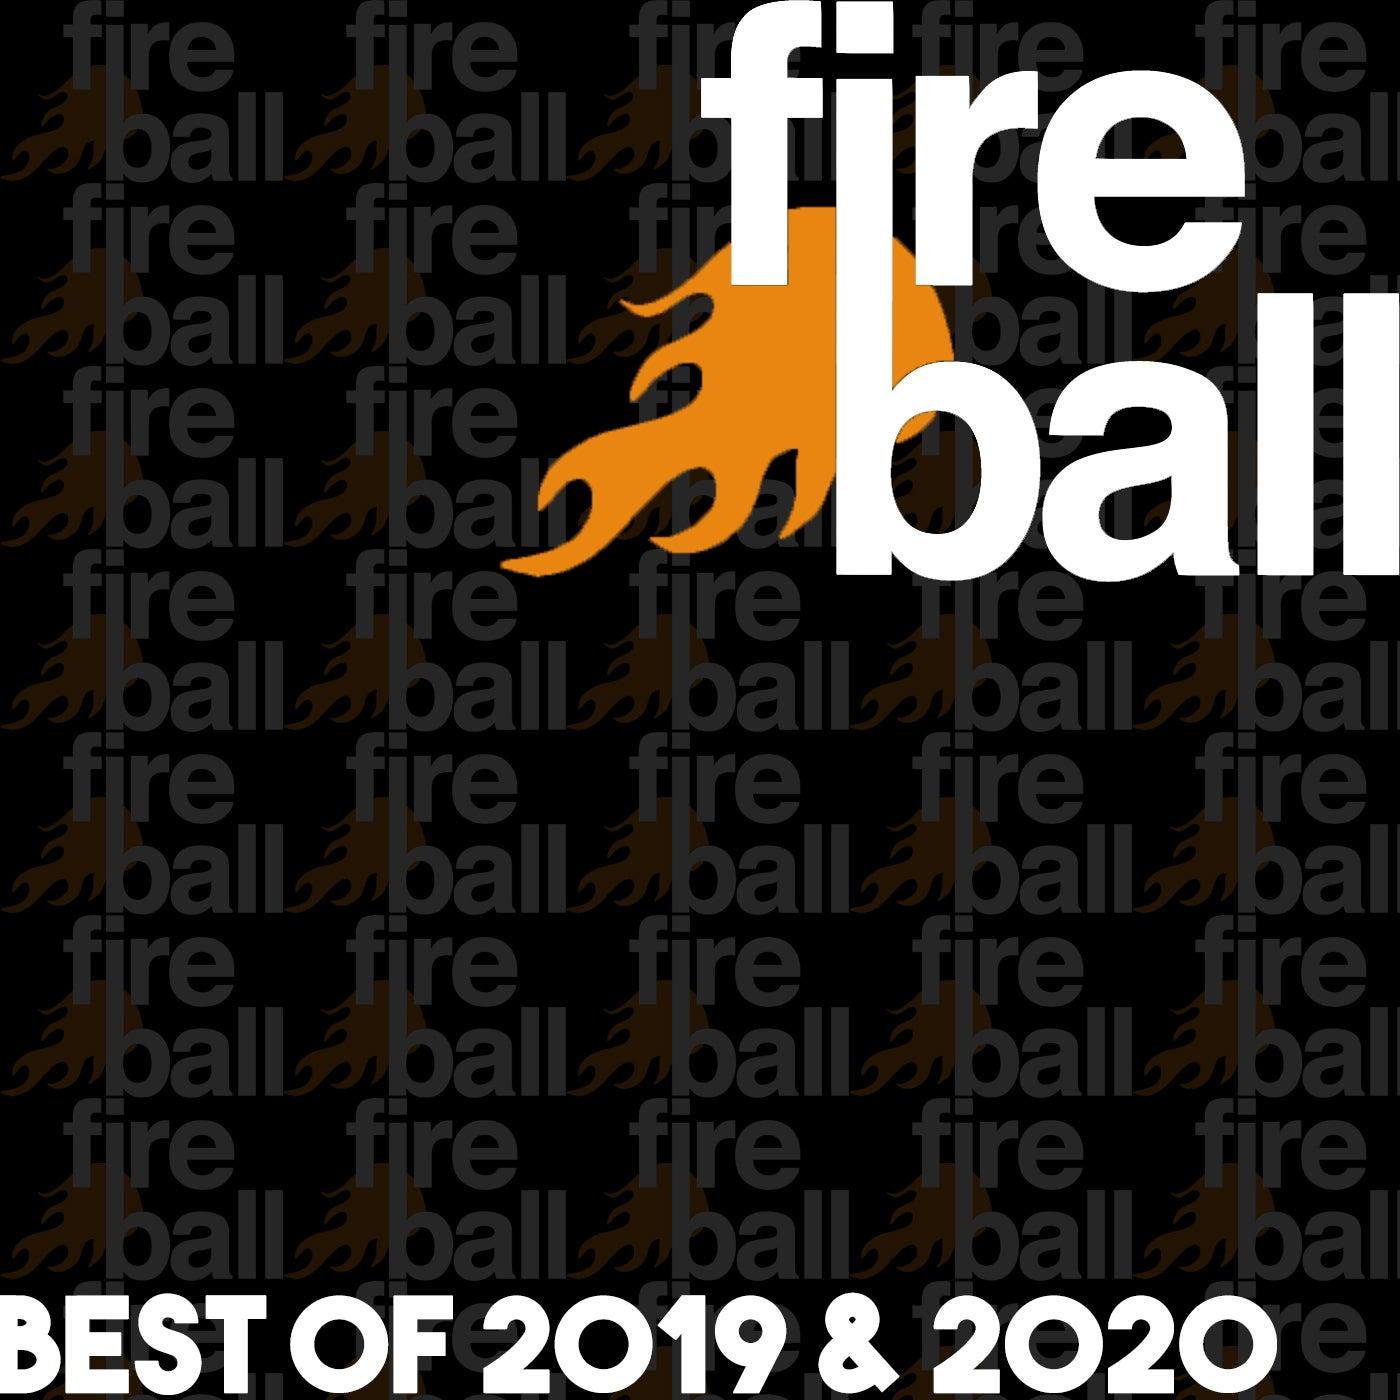 Fireball Recordings: Best Of 2019 & 2020